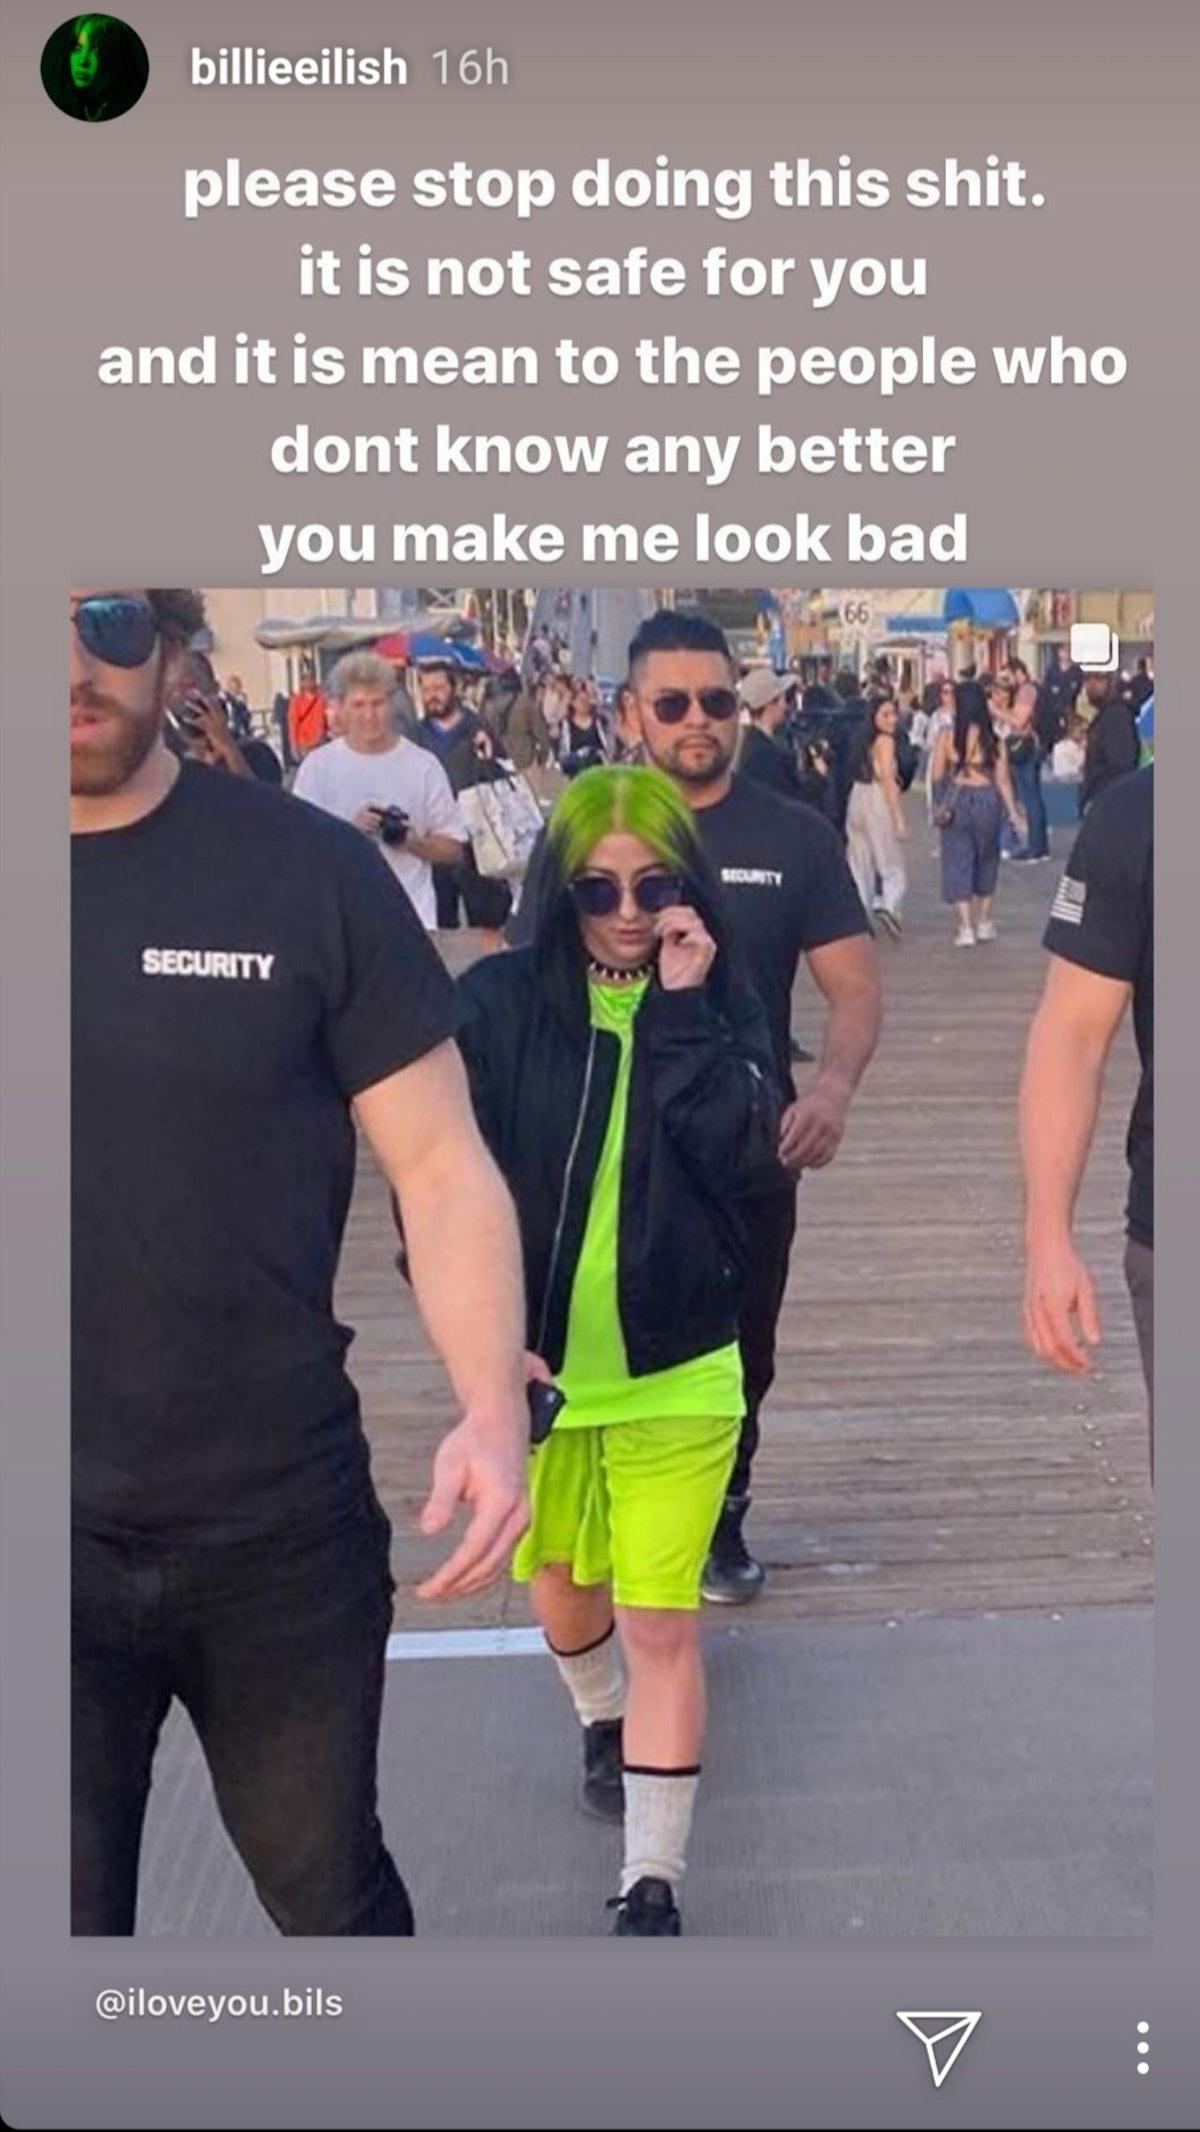 A screenshot of Billie Eilish's Instagram calling out impersonators.